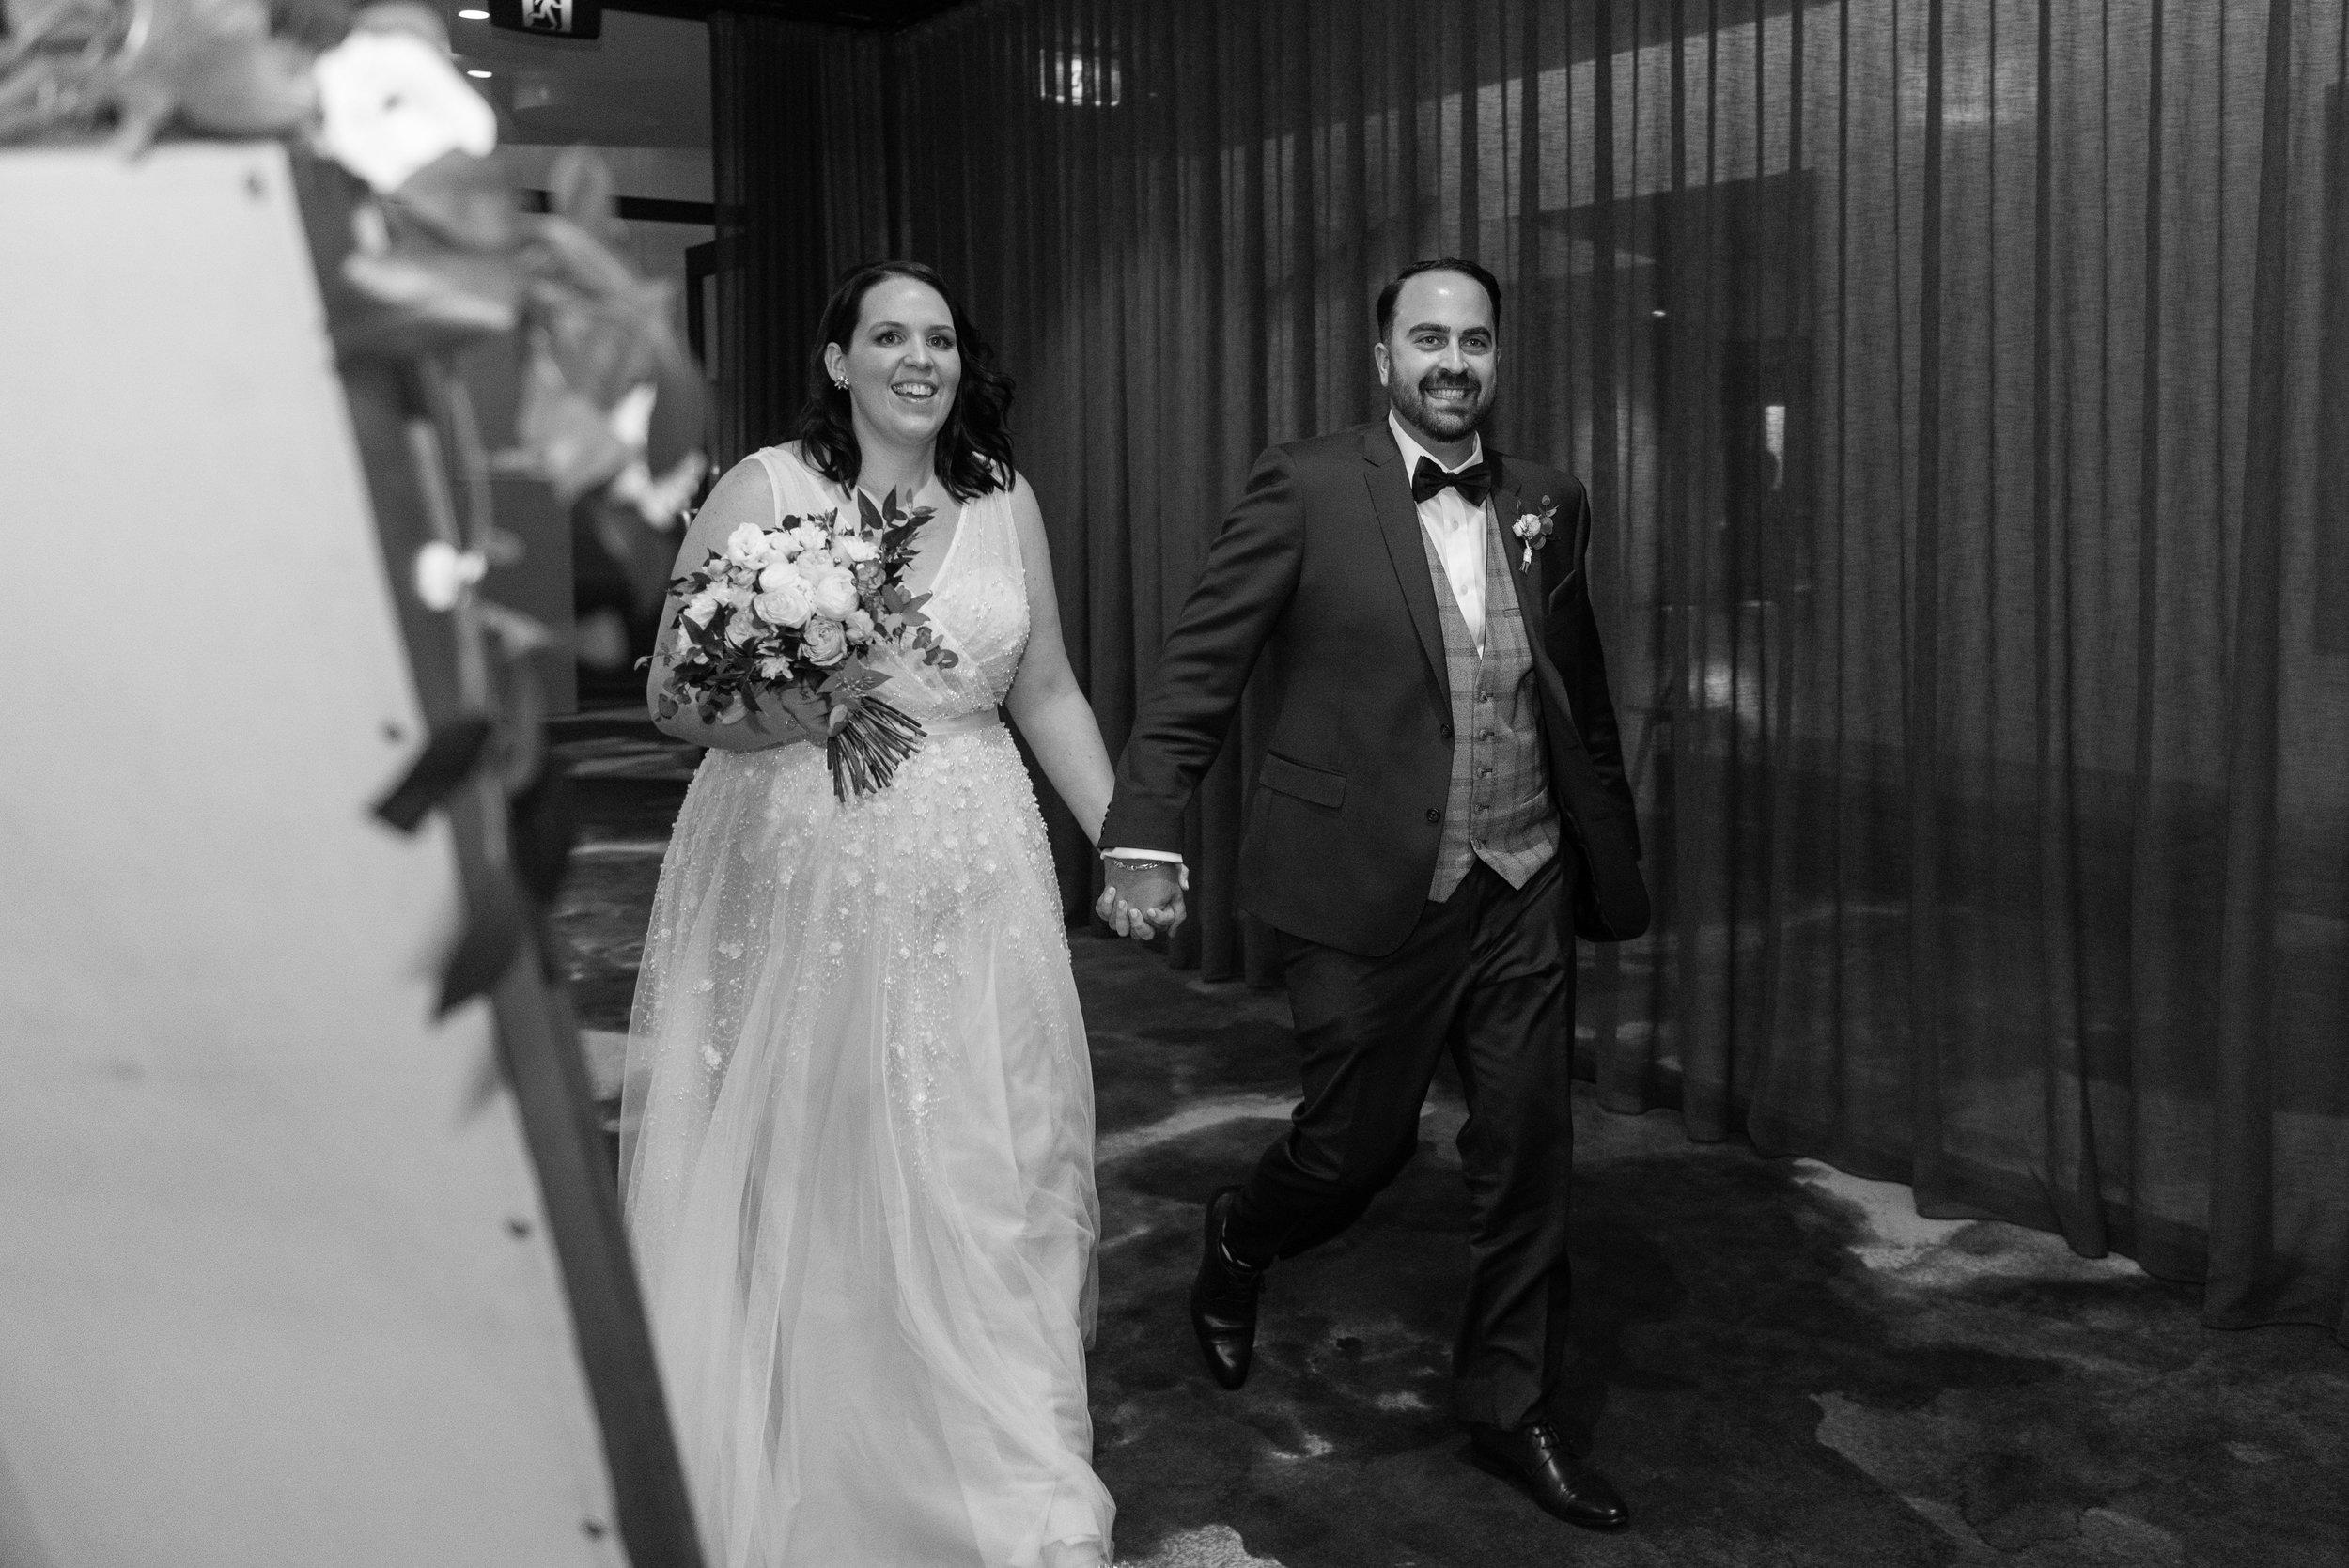 brisbane-city-wedding-photographer-romantic-wedding-83.jpg